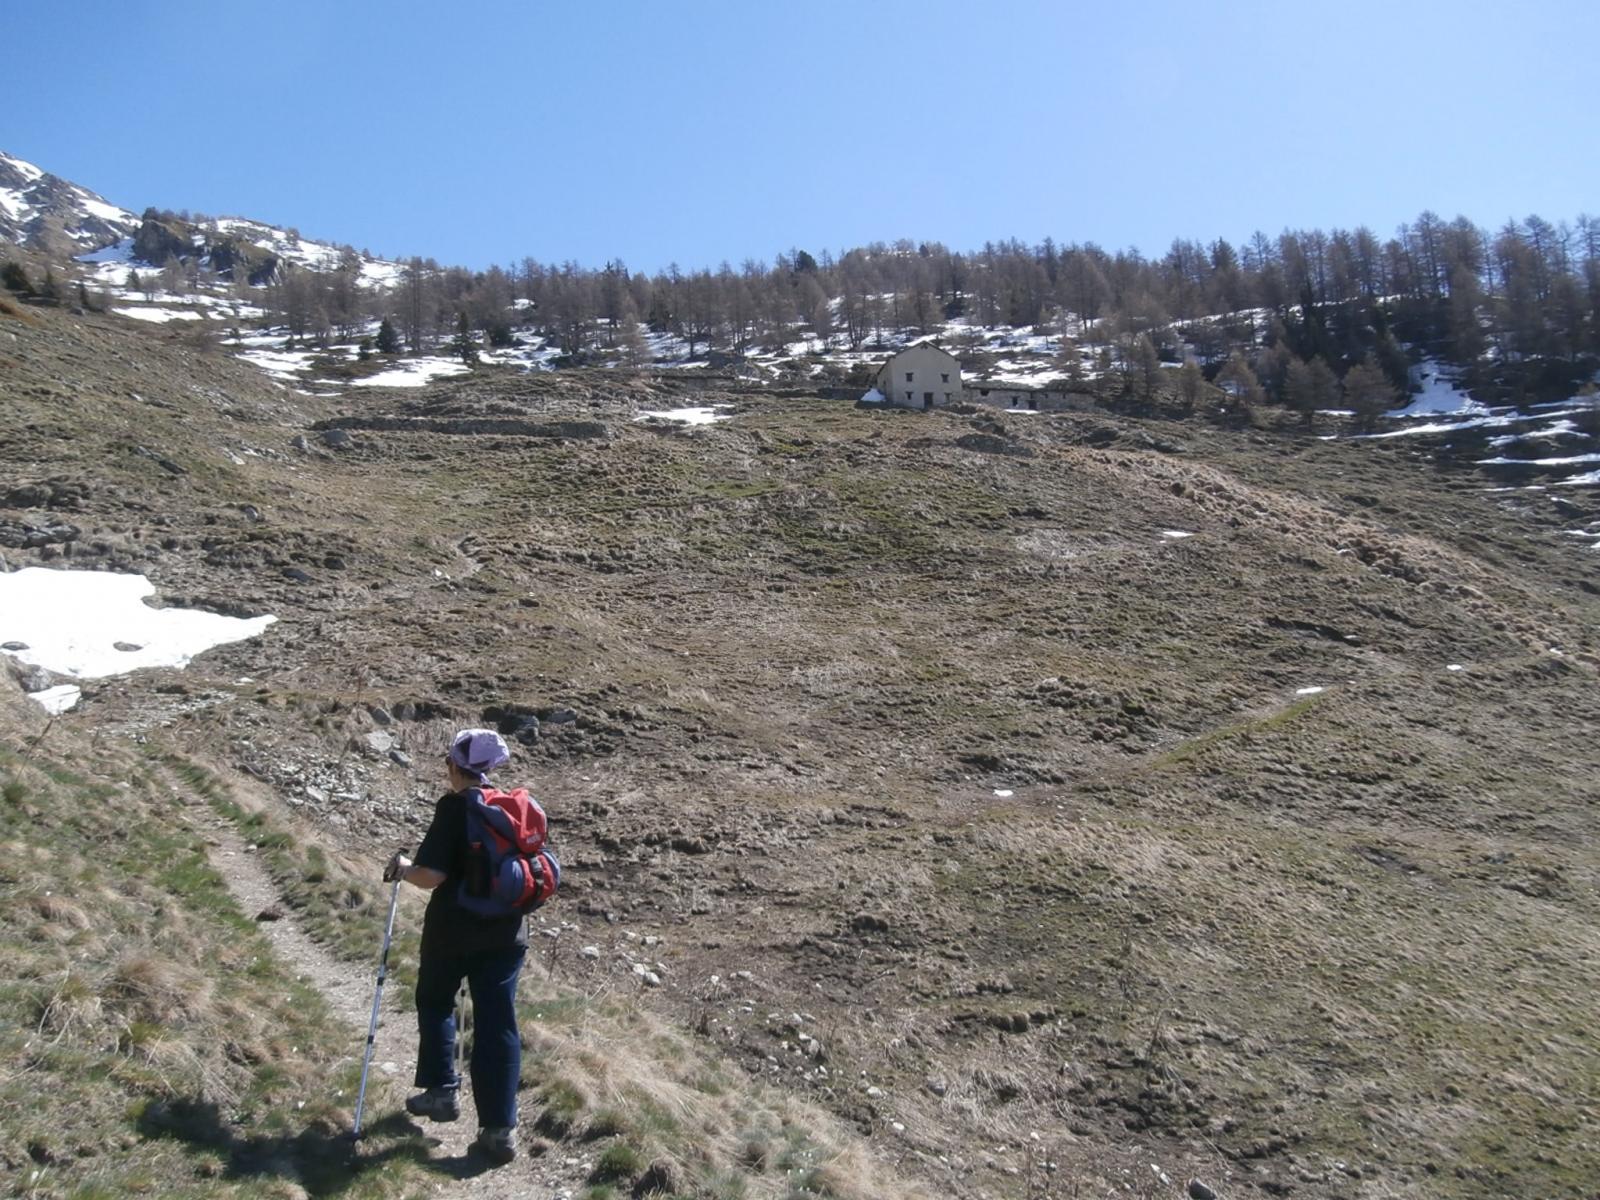 l'arrivo alle baite  inferiori in totale assenza di neve...